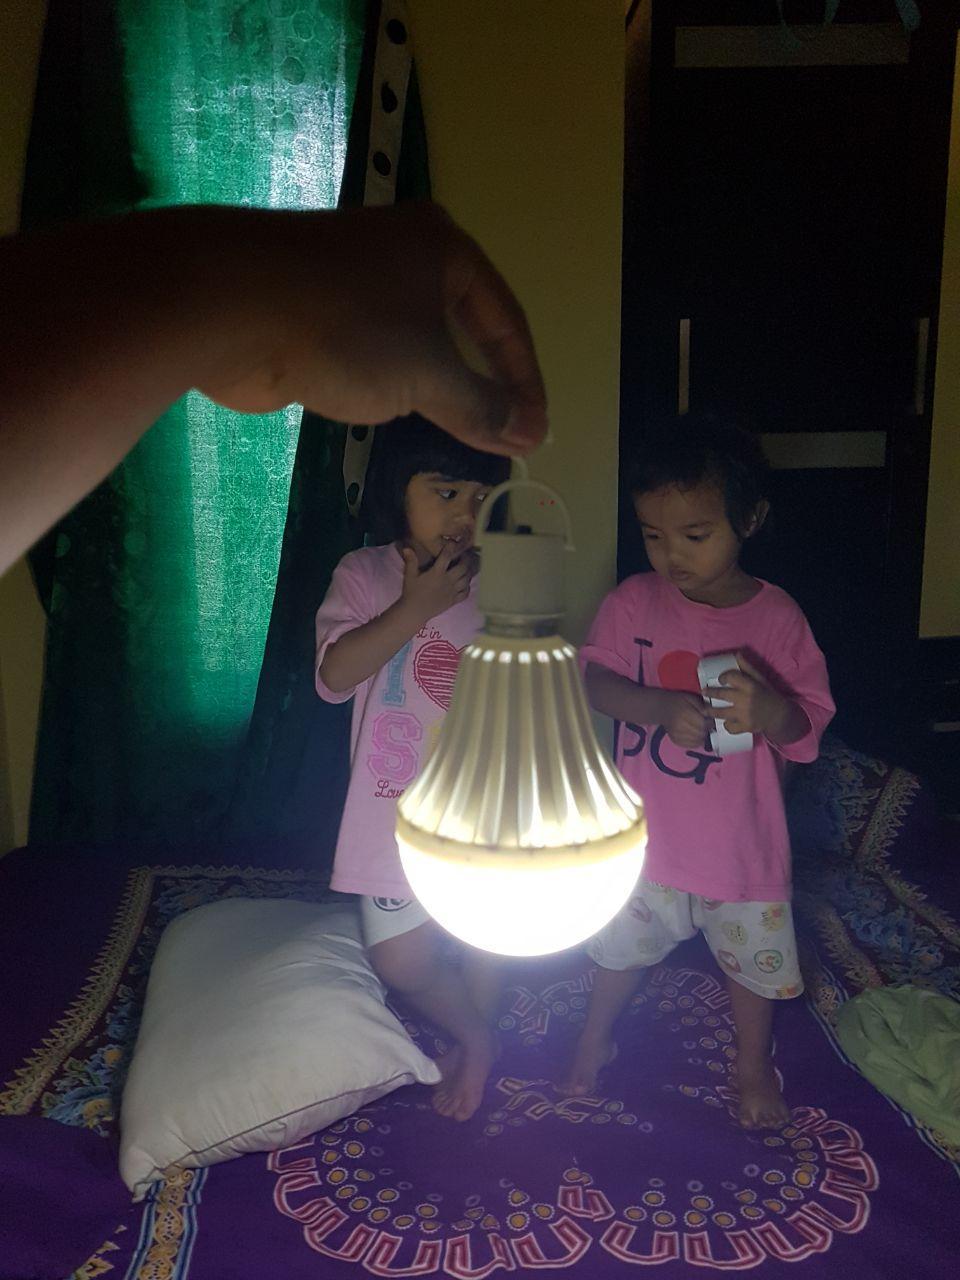 PROMO MURAH!BOHLAM LAMPU AJAIB SENTER LED EMERGENCY MATI LAMPU YAZUHO 15 WATT TERBAIK TERANG BANGET